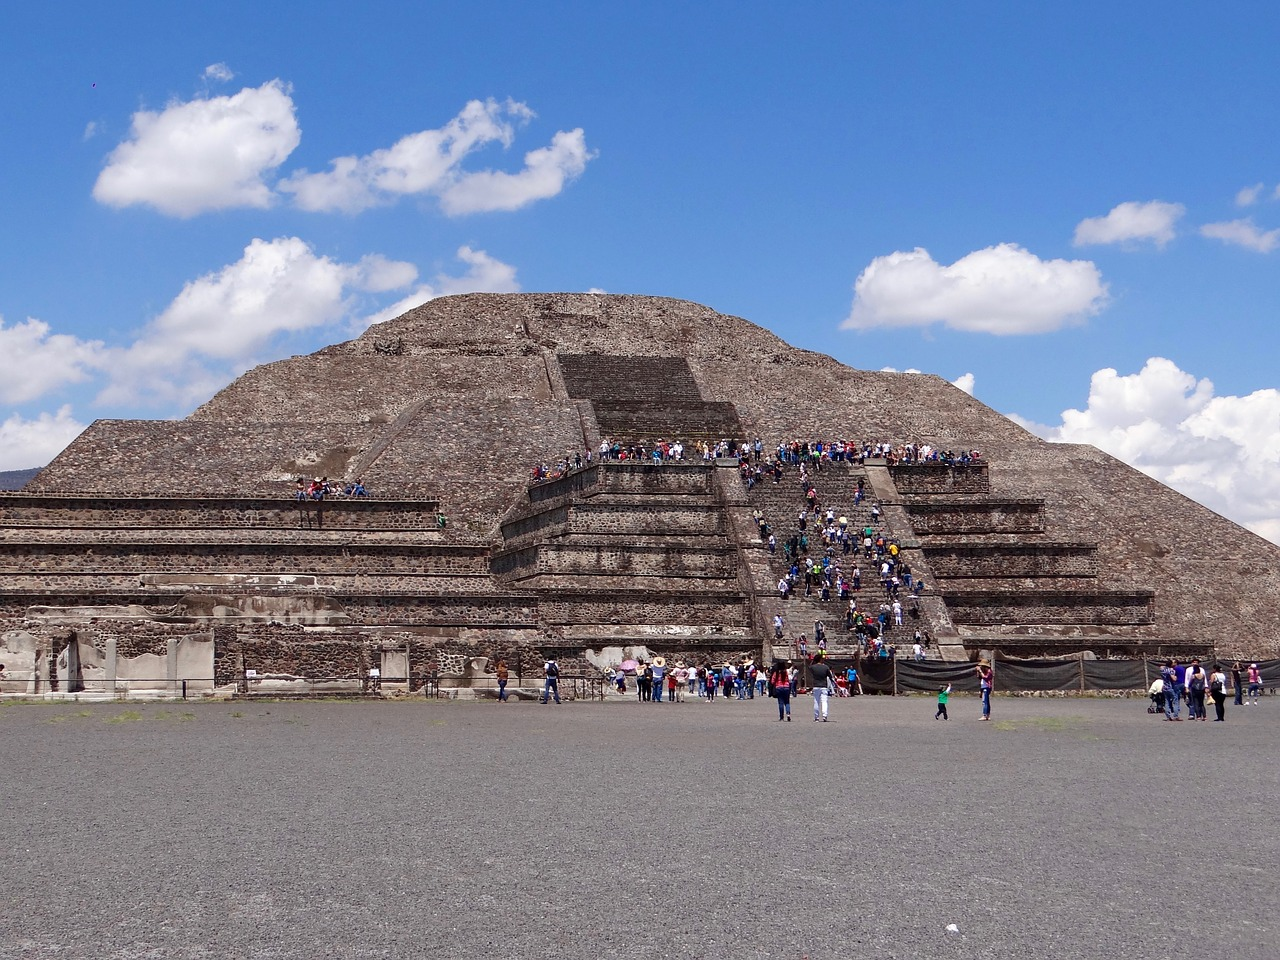 Complexul arheologic Teotihuacan1111